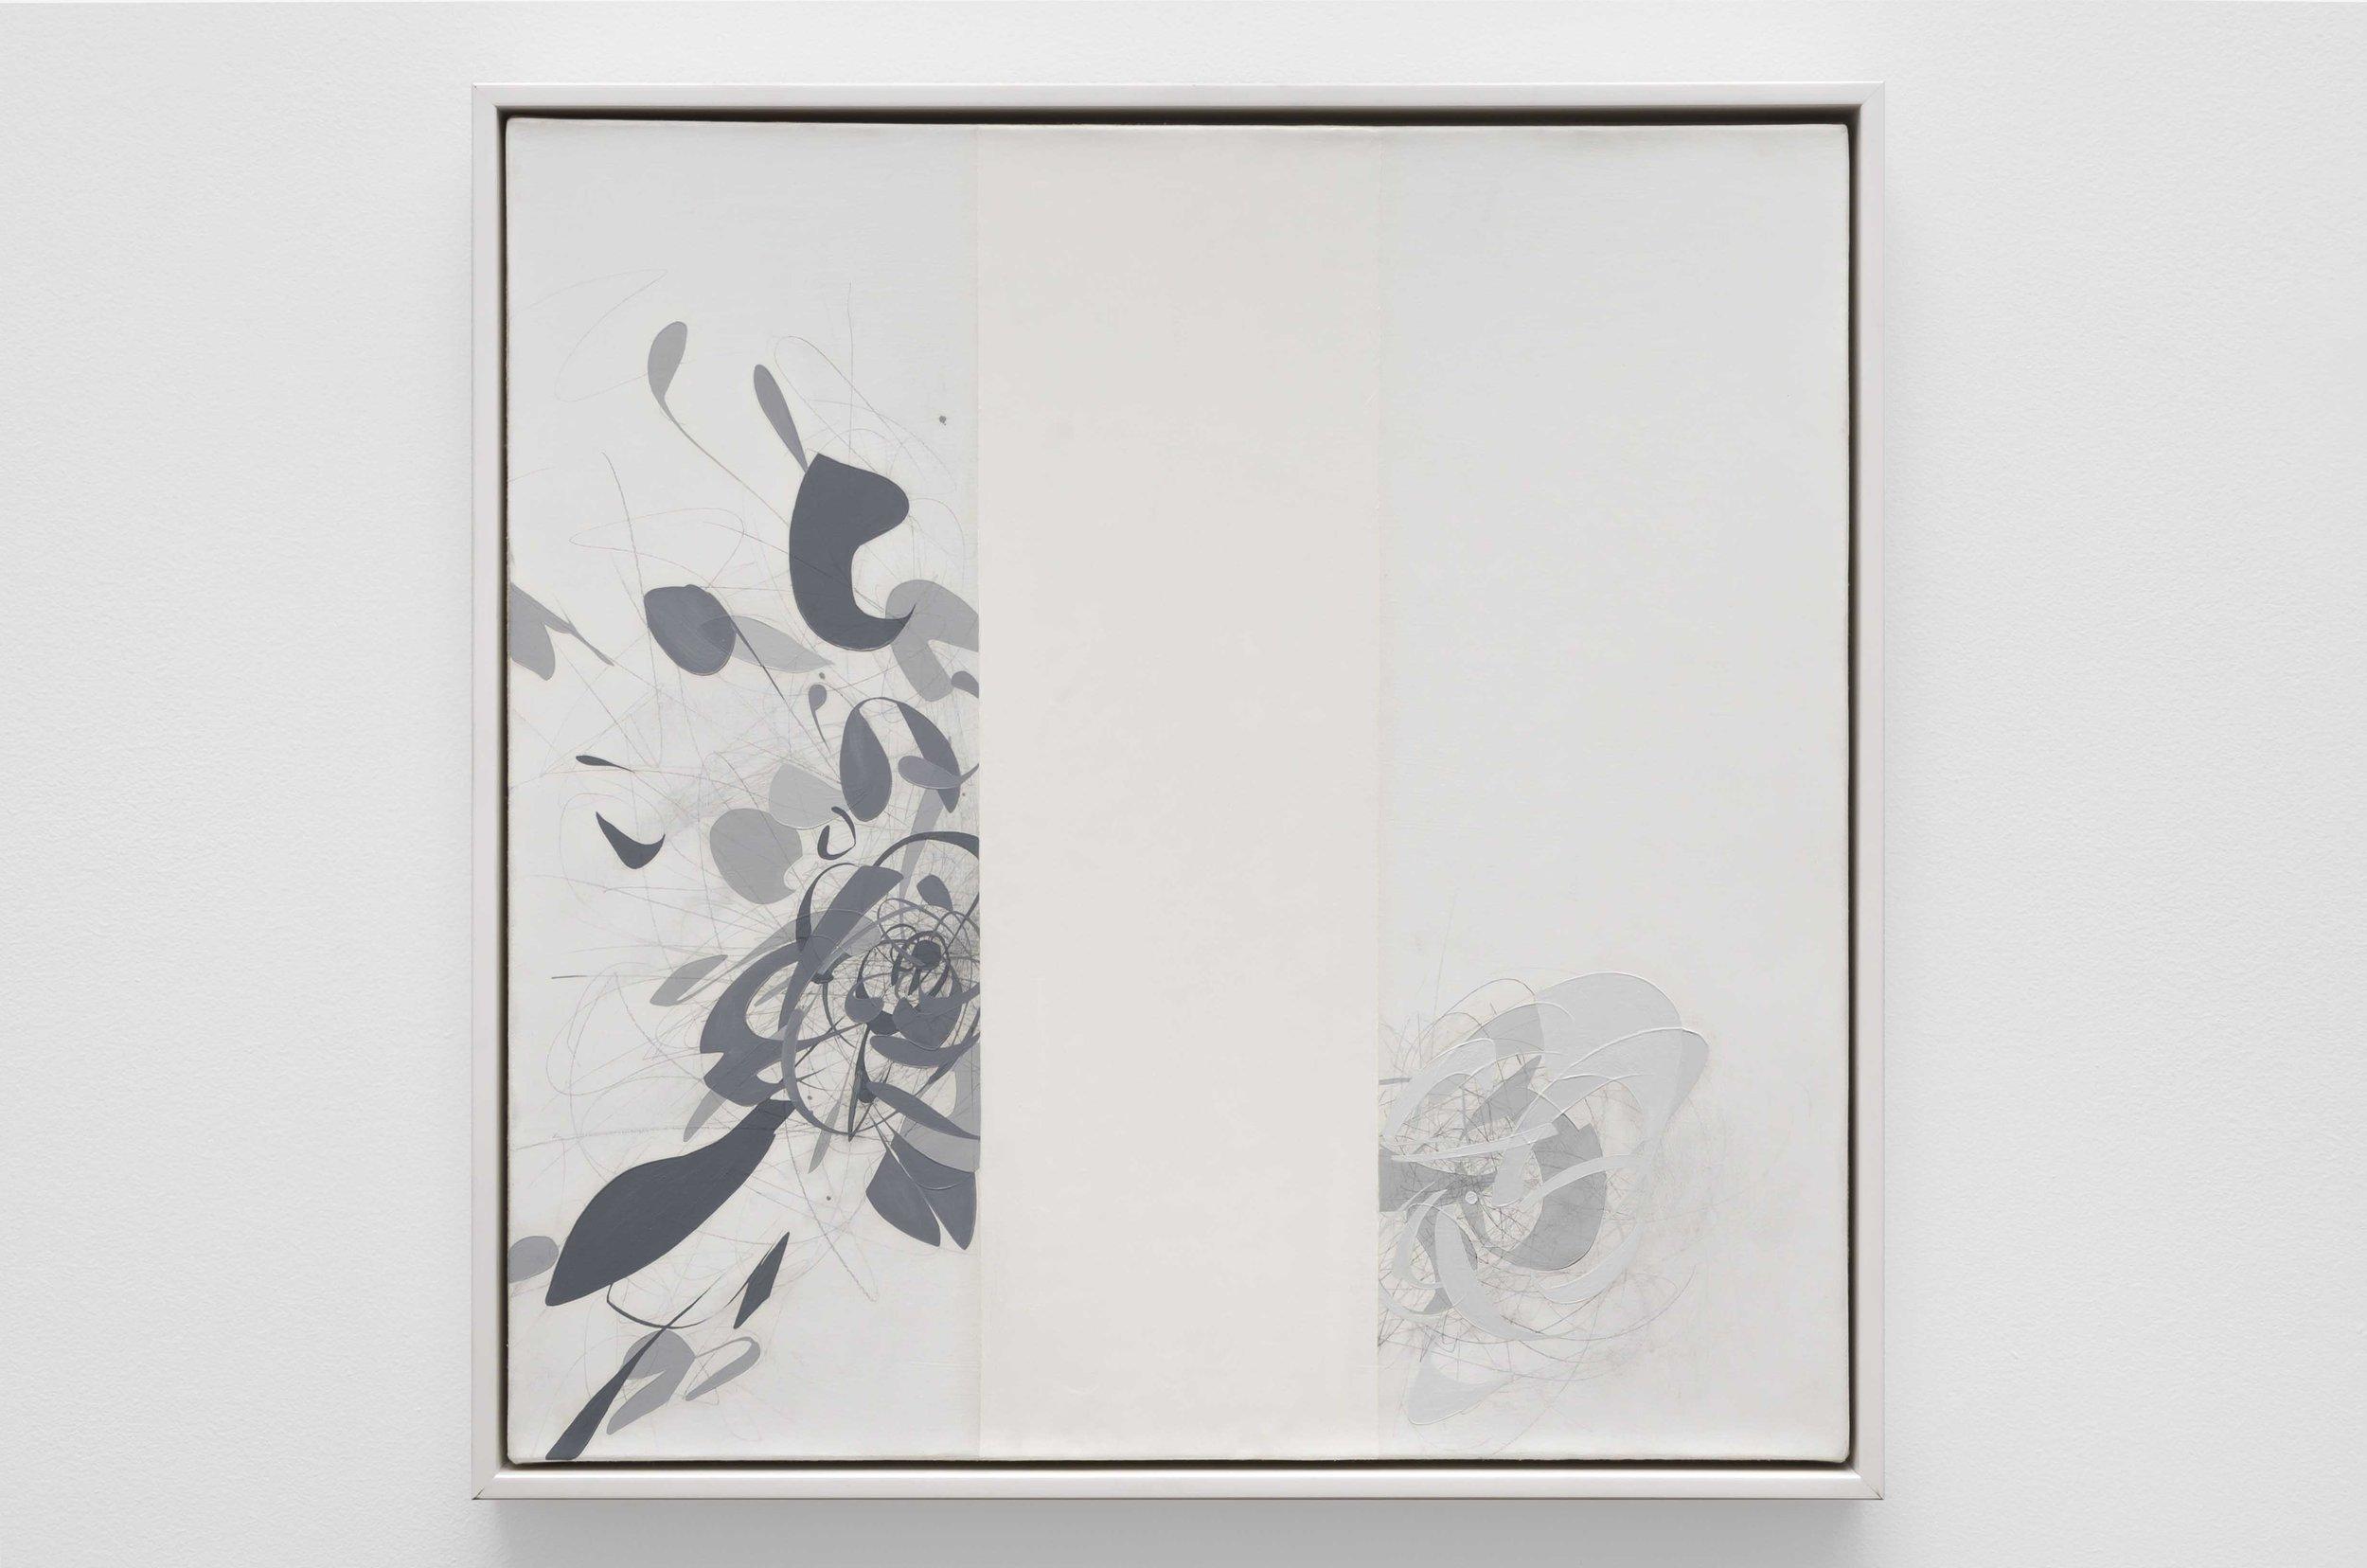 Seann Brackin (b. 1976)   Future Vision , 2018  oil and graphite on canvas  20 x 20 inches; 50.8 x 50.8 centimeters